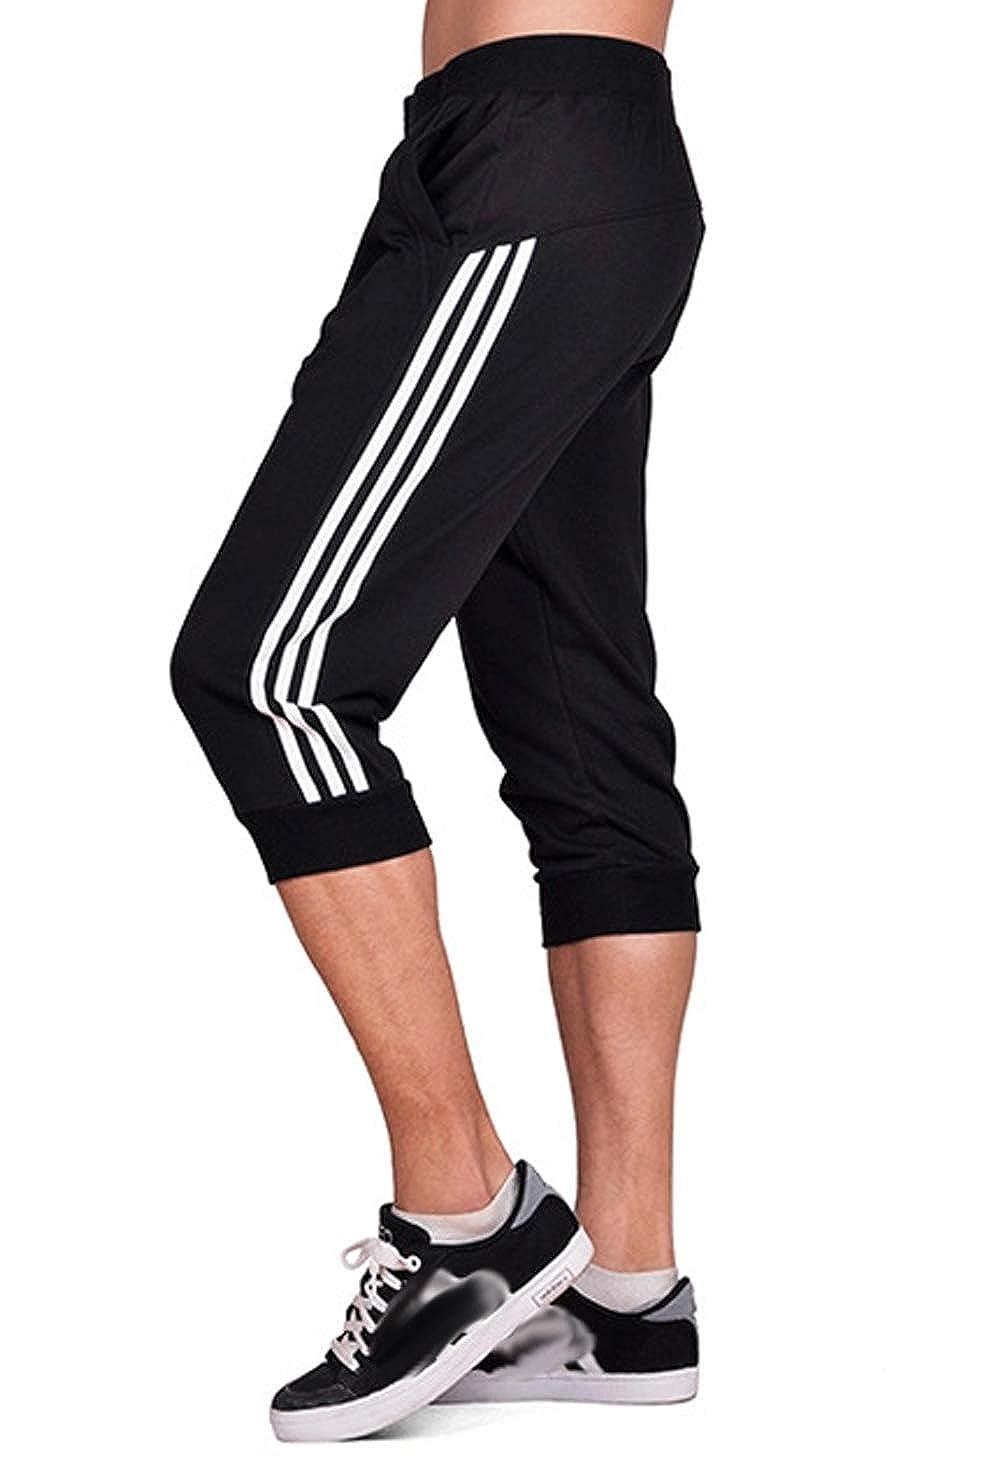 Anikigu Hombre Pantalones Cortos Jogging Bolsillos Deportivo Casual Deporte Pantal/ón Chandal de Hombre Fitness Jogging 3//4 Longitud